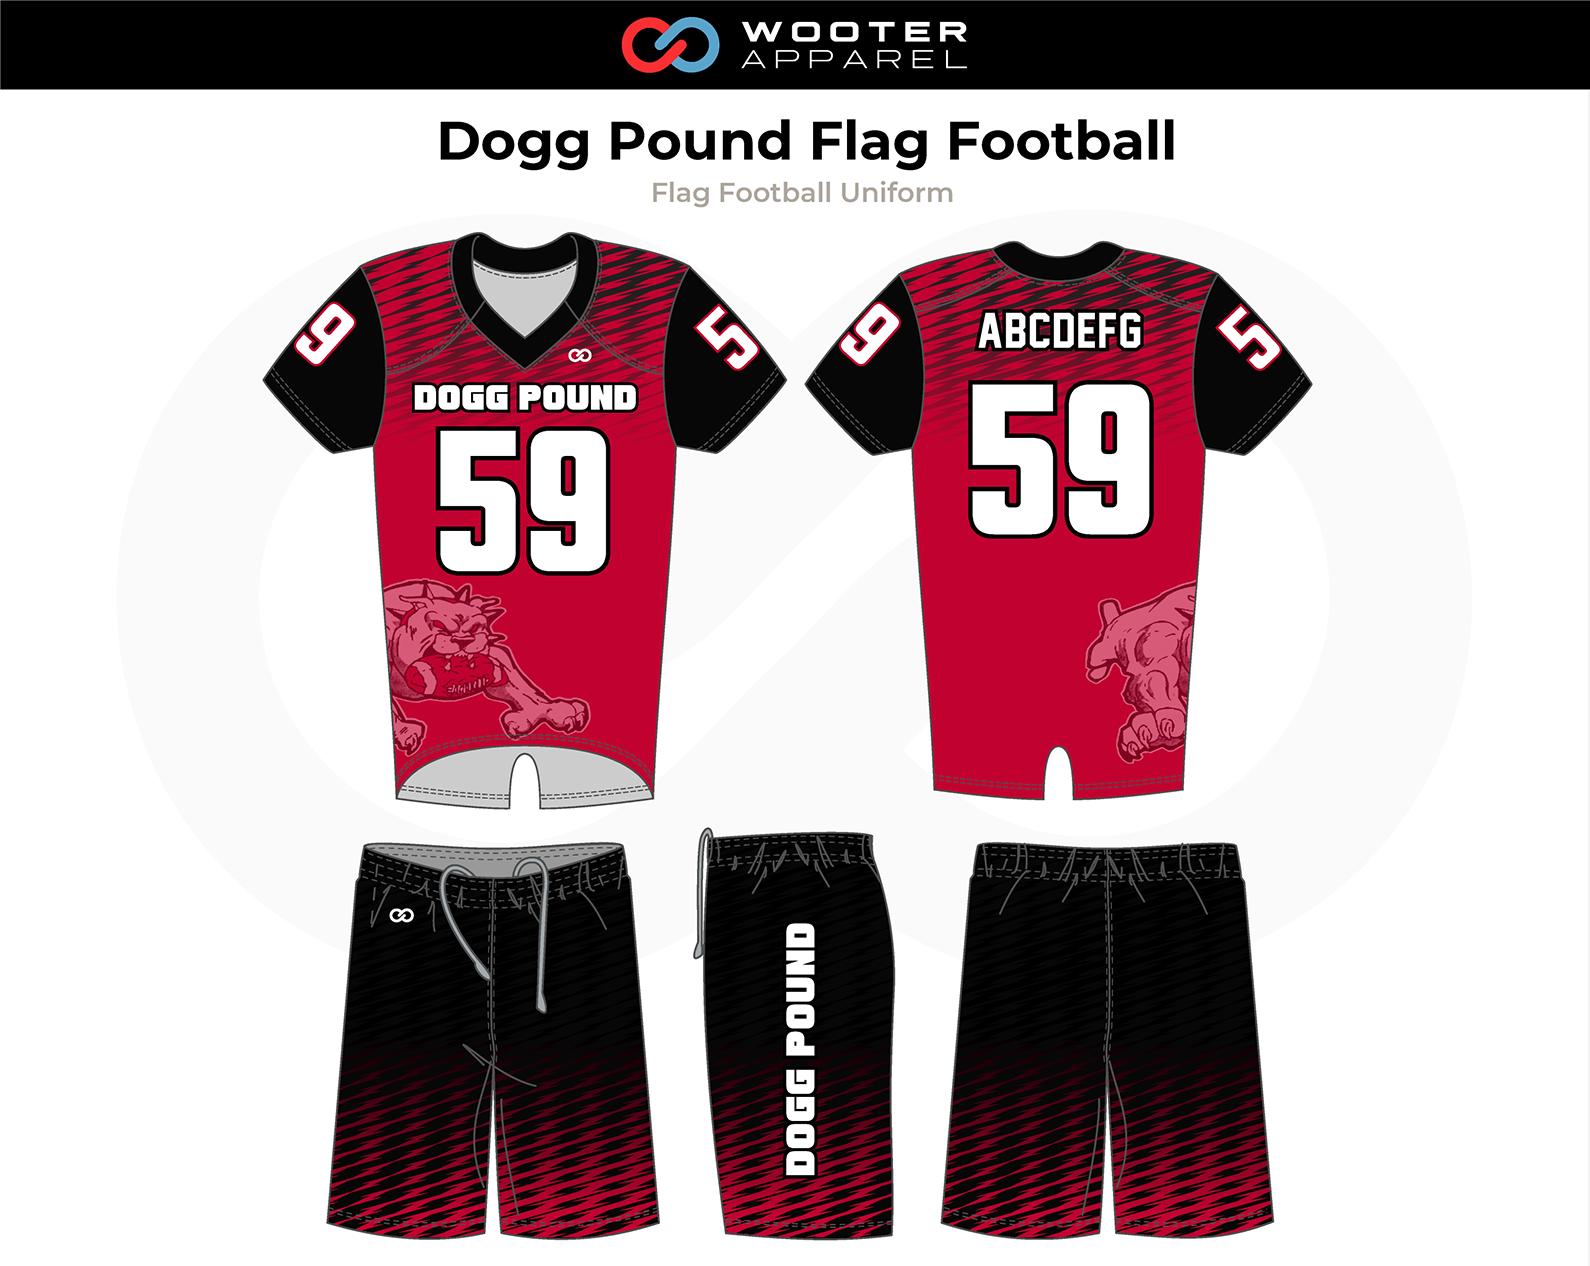 2018-10-29 Dogg Pound Flag Football Uniform B1.png